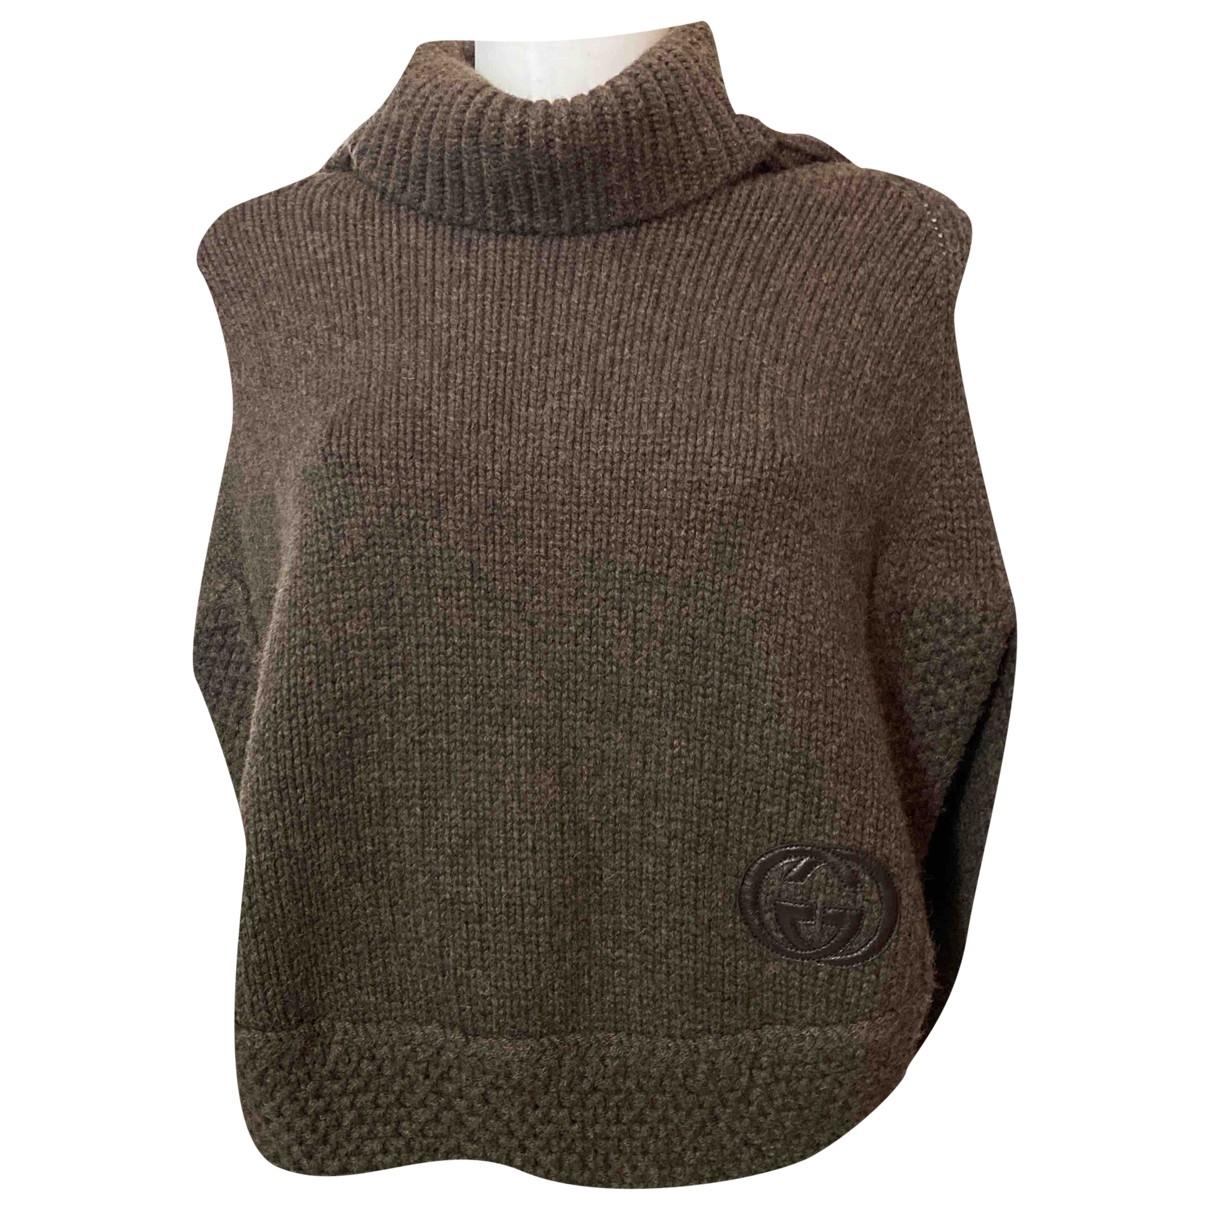 Gucci \N Wool jacket for Women XS International